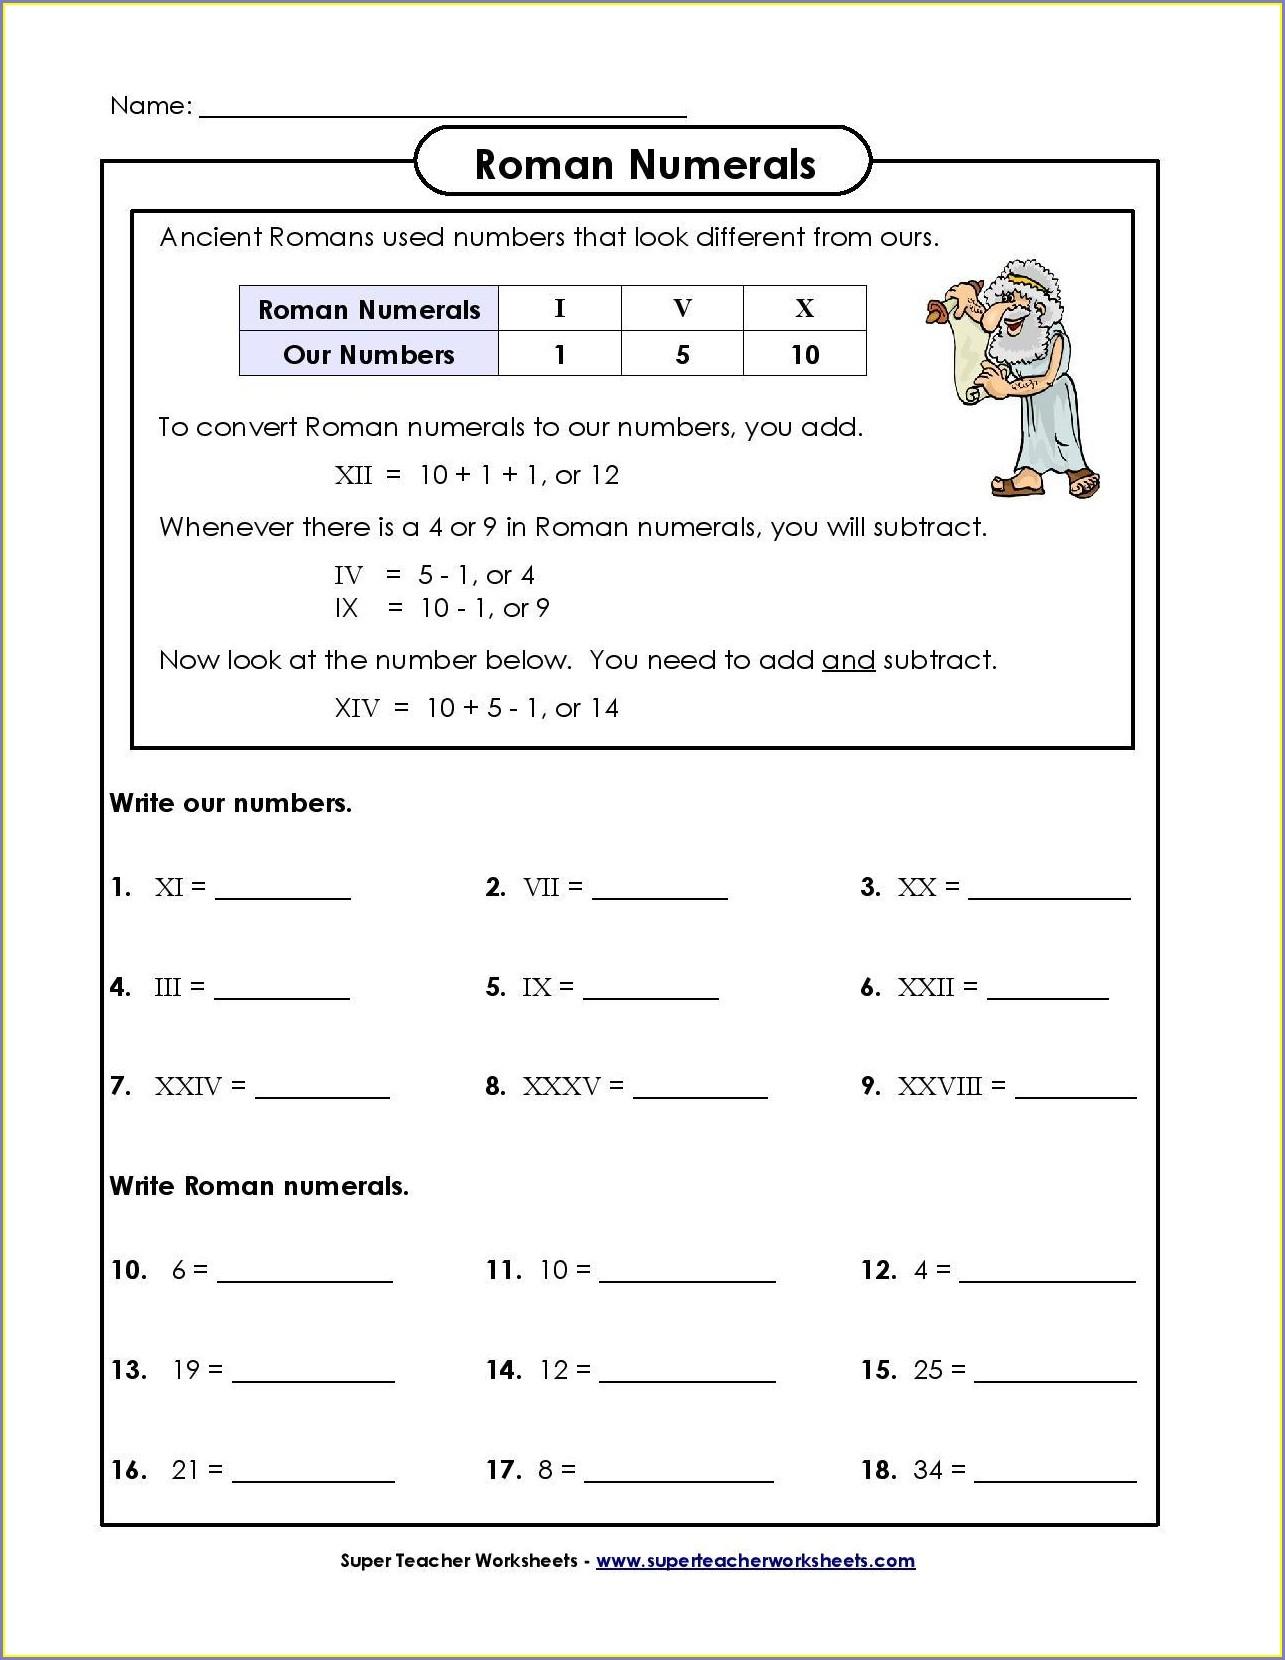 Roman Numeral Addition Worksheet